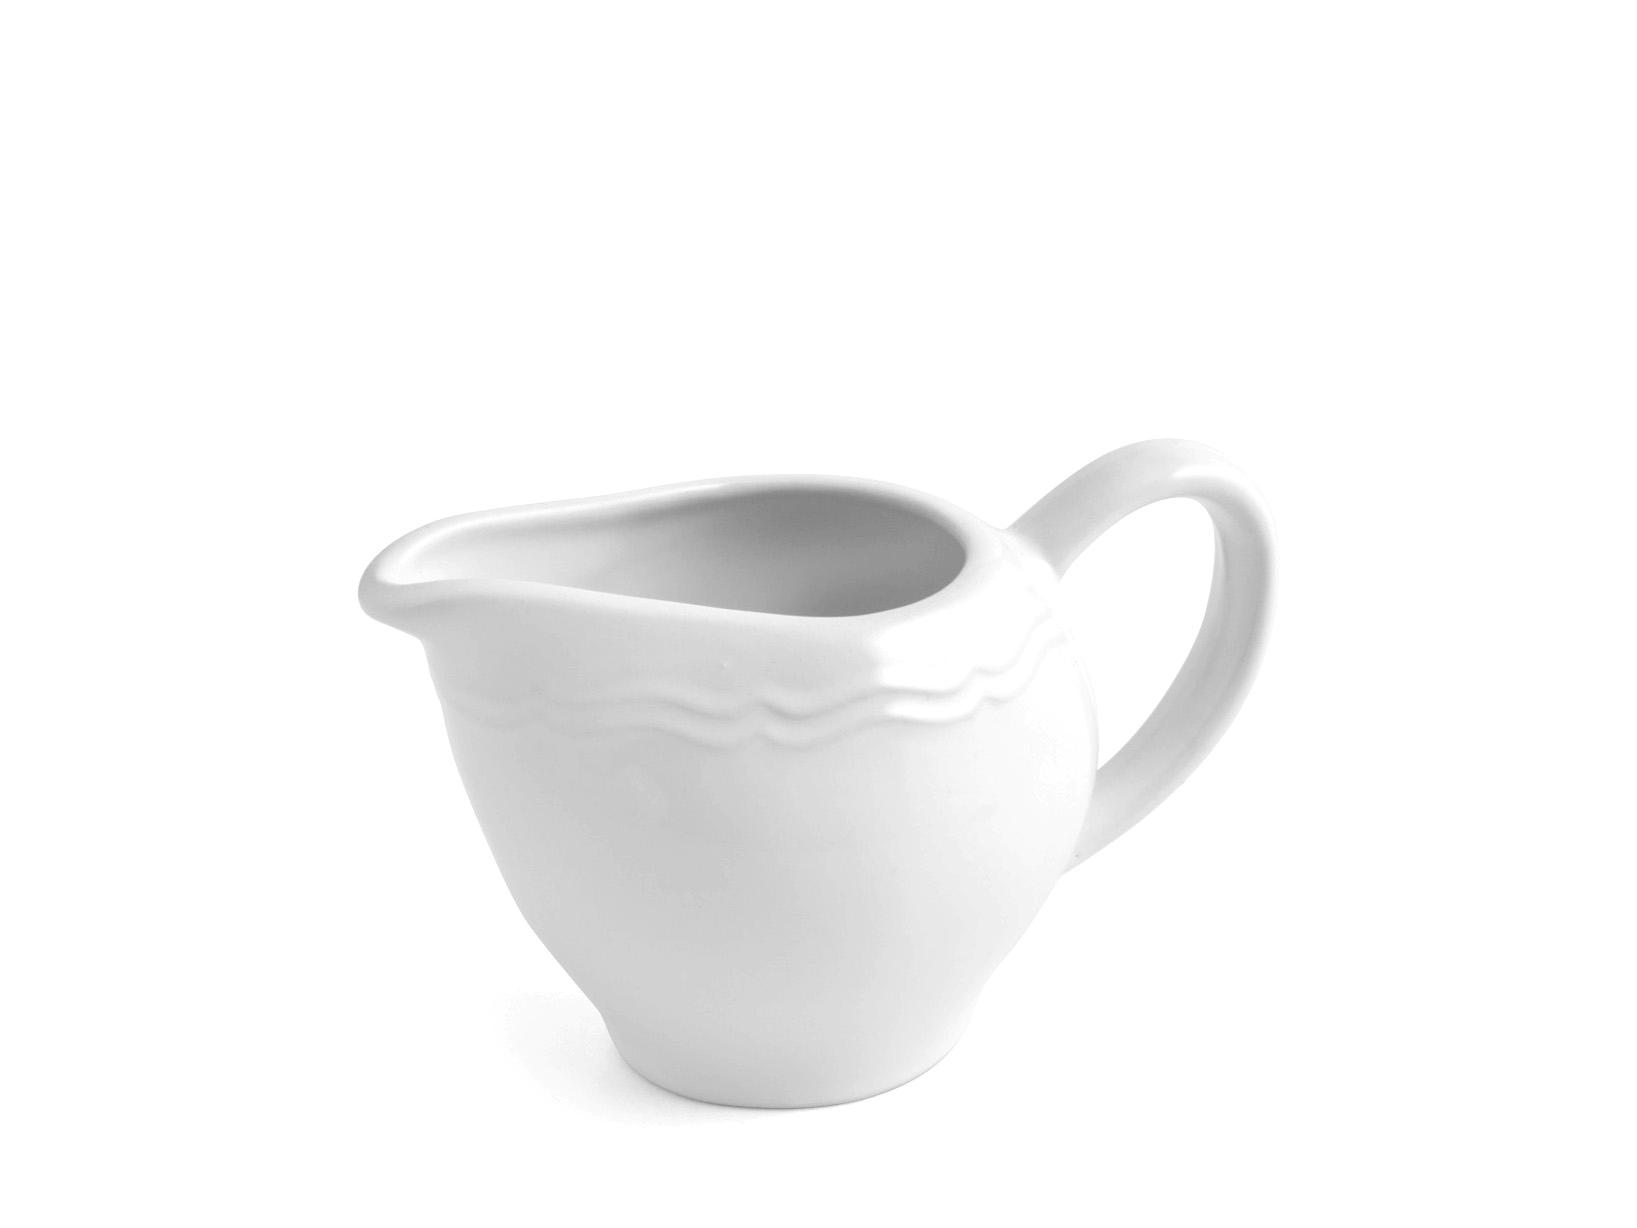 Lattiera In Ceramica, Bianco